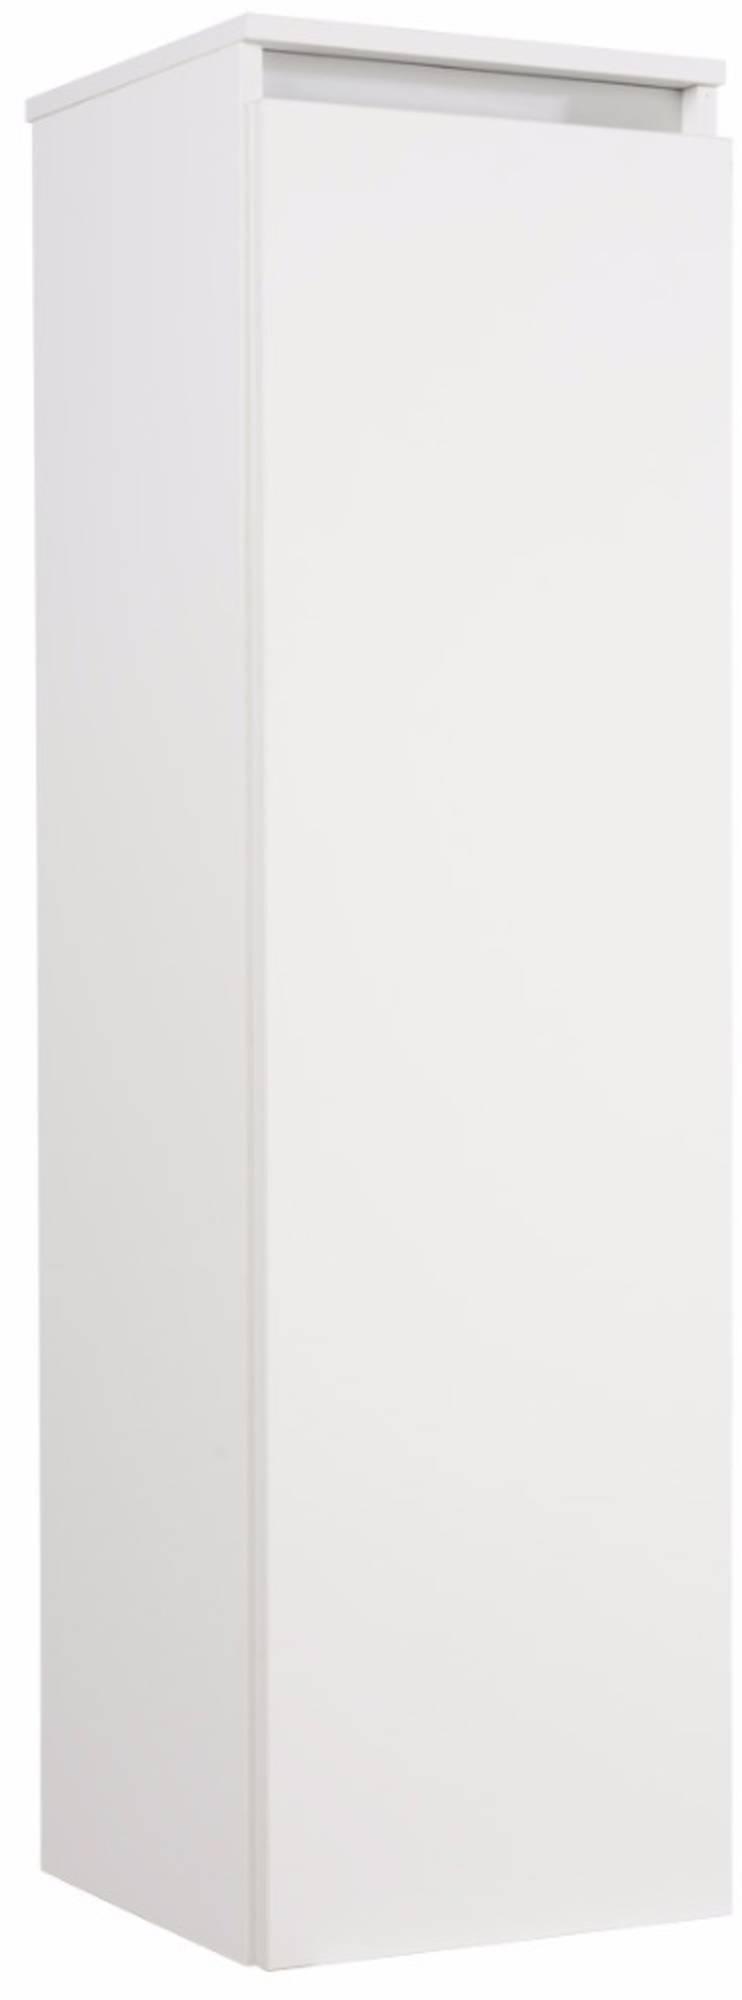 Saniselect Guarda Halfhoge Kast Rechts 35x34x120 cm Wit